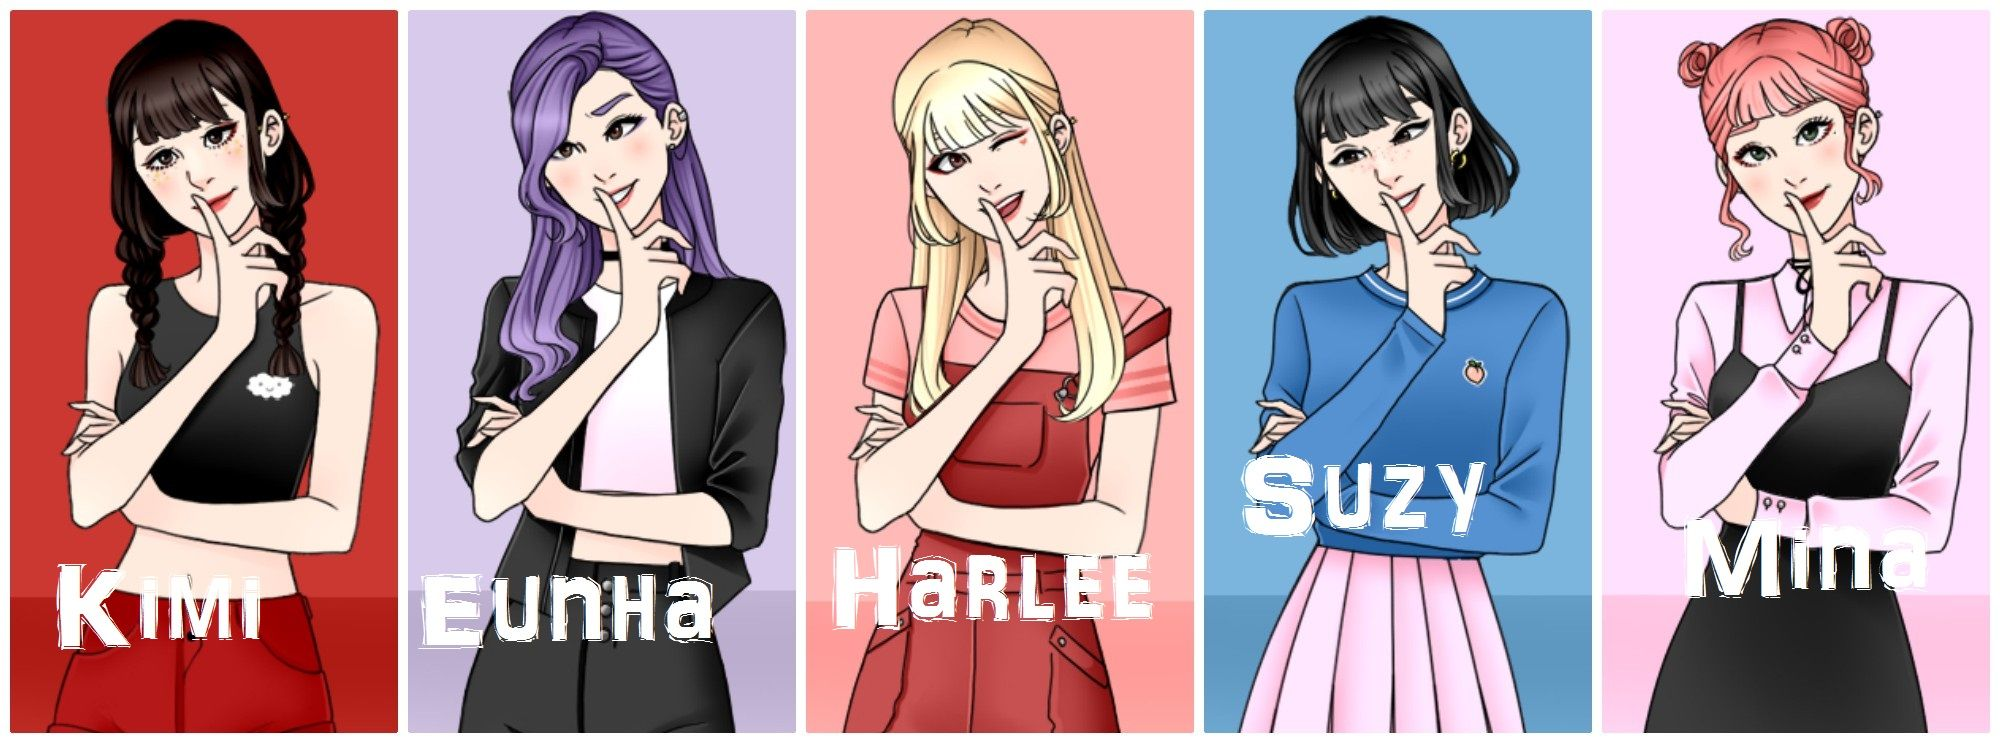 K Pop Idol Girl Group Belongs Me Demiwitch Of Mischief My Oc S Kimi Eunha Harlee Suzy And Mina Girl Group Pop Idol Kpop Idol